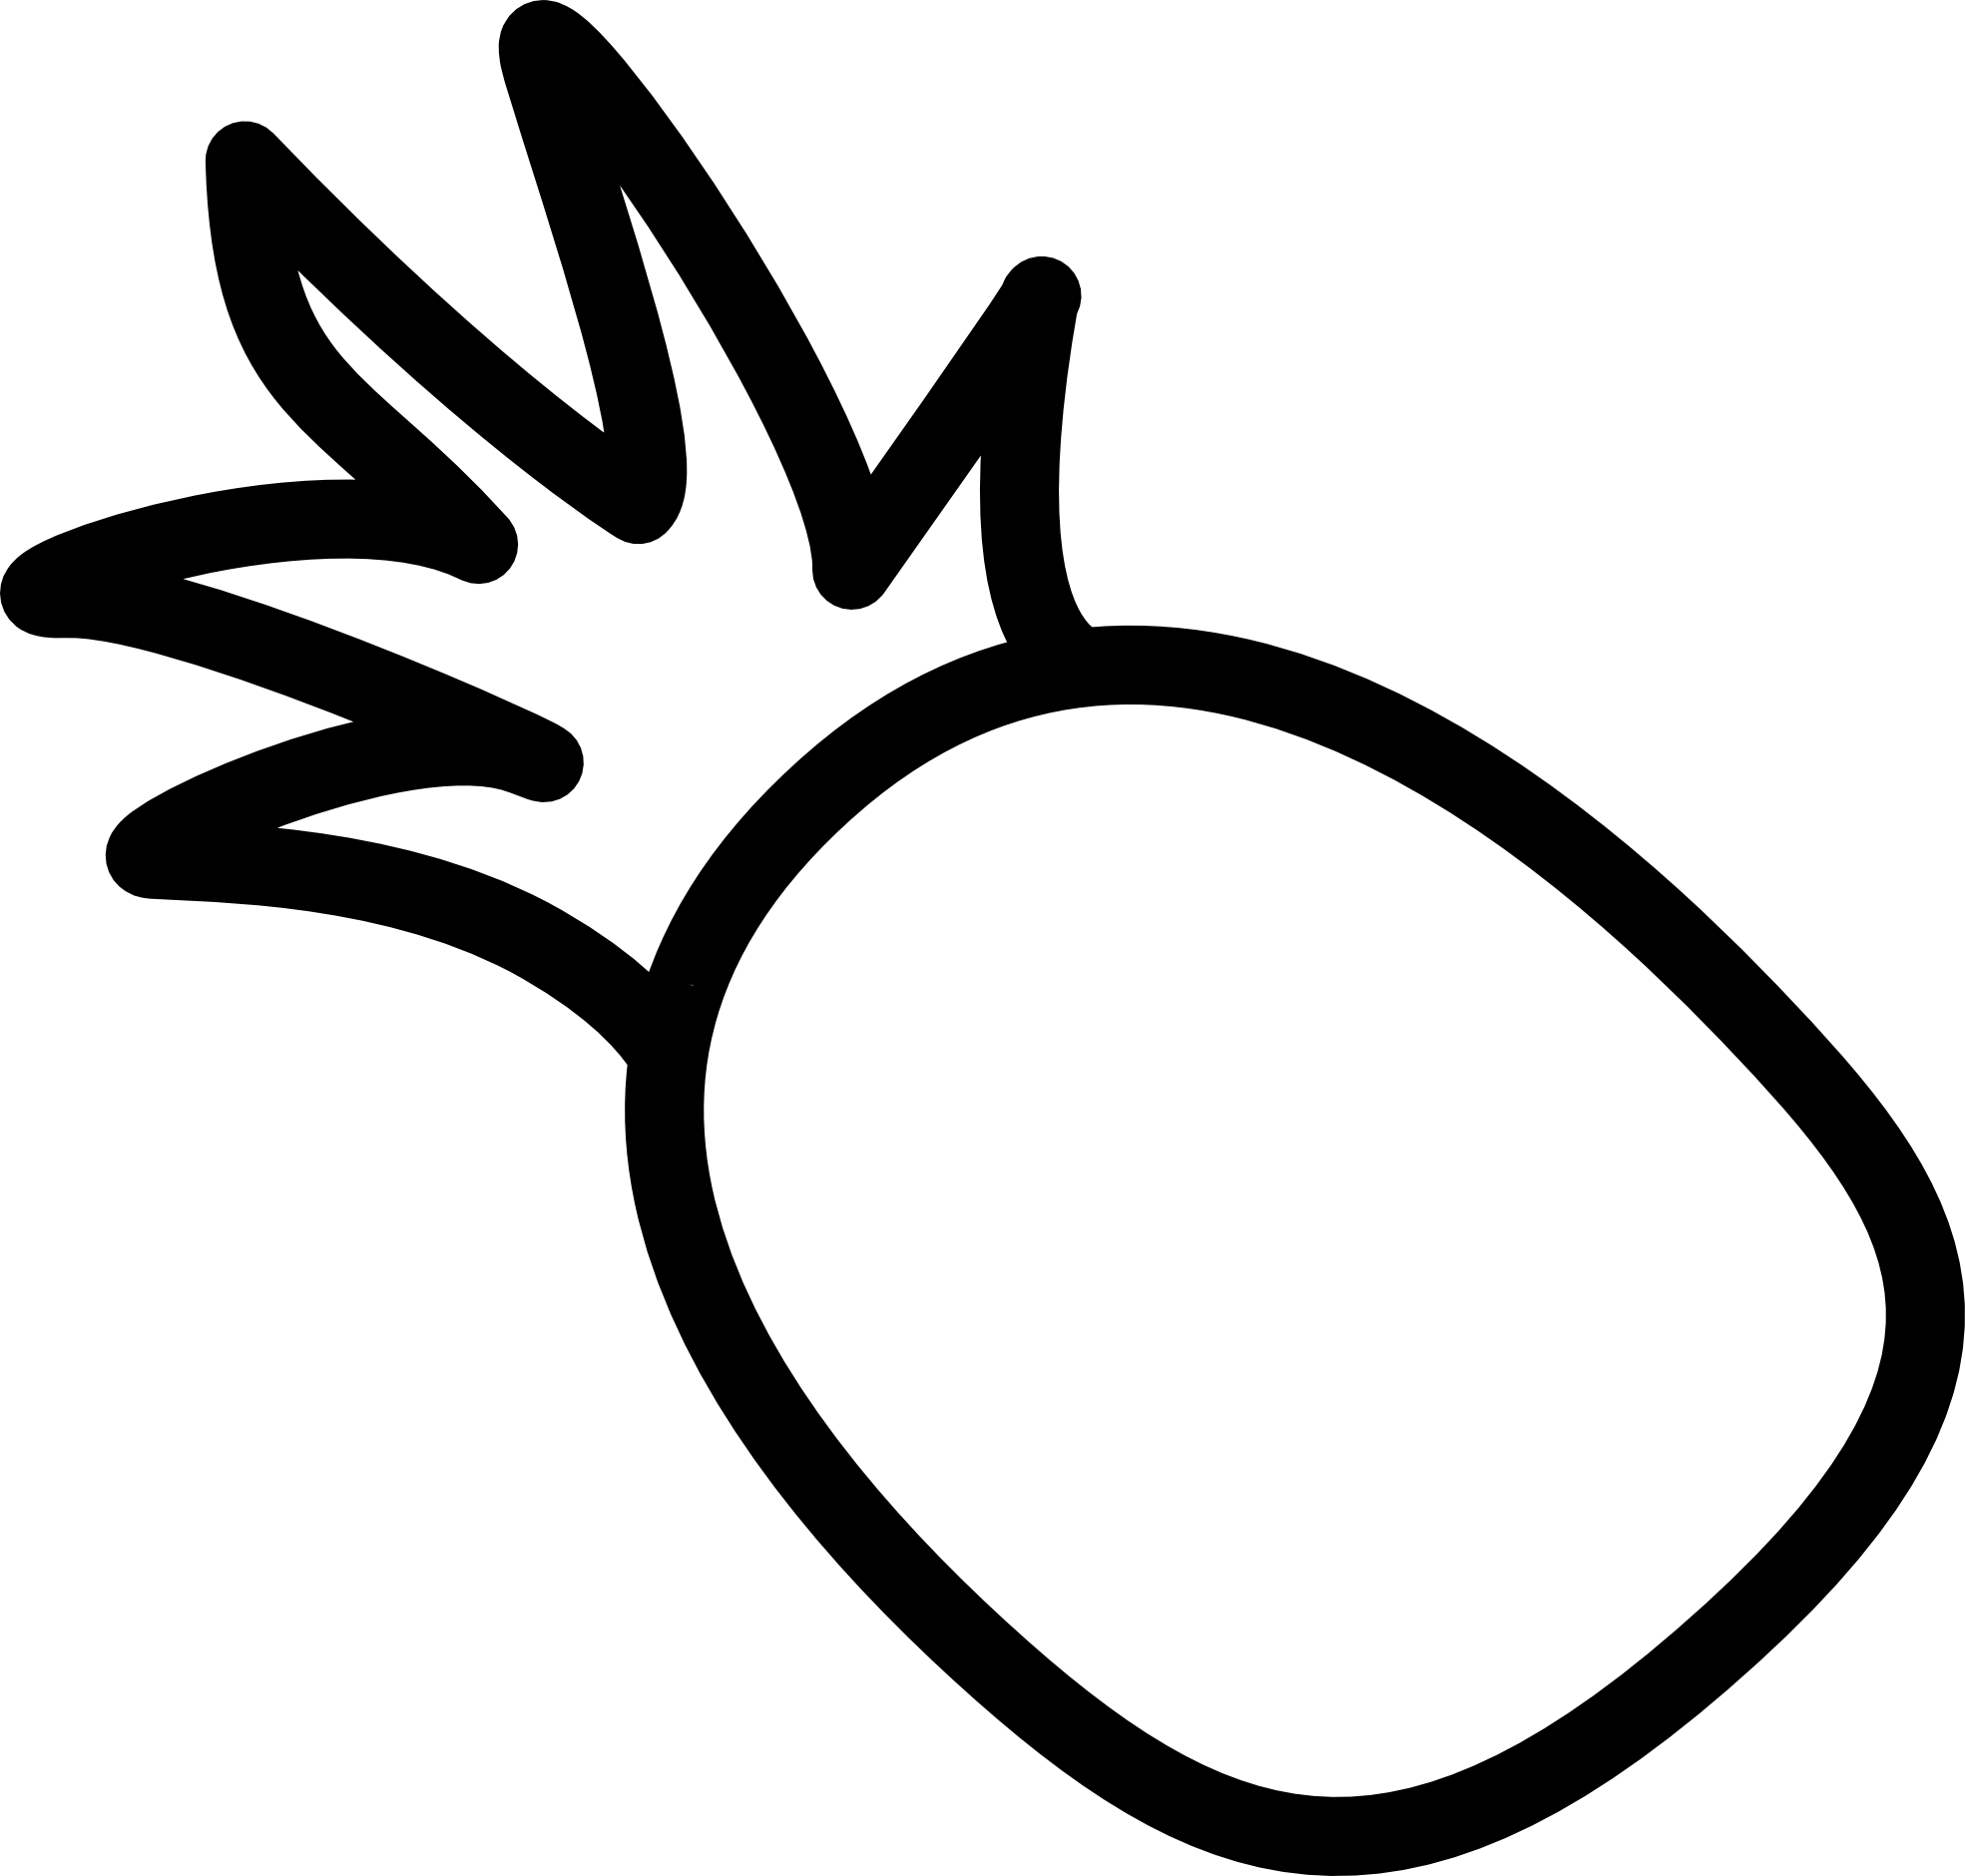 Adobe Illustrator Clip Art | Pineapple drawing, Pineapple ...